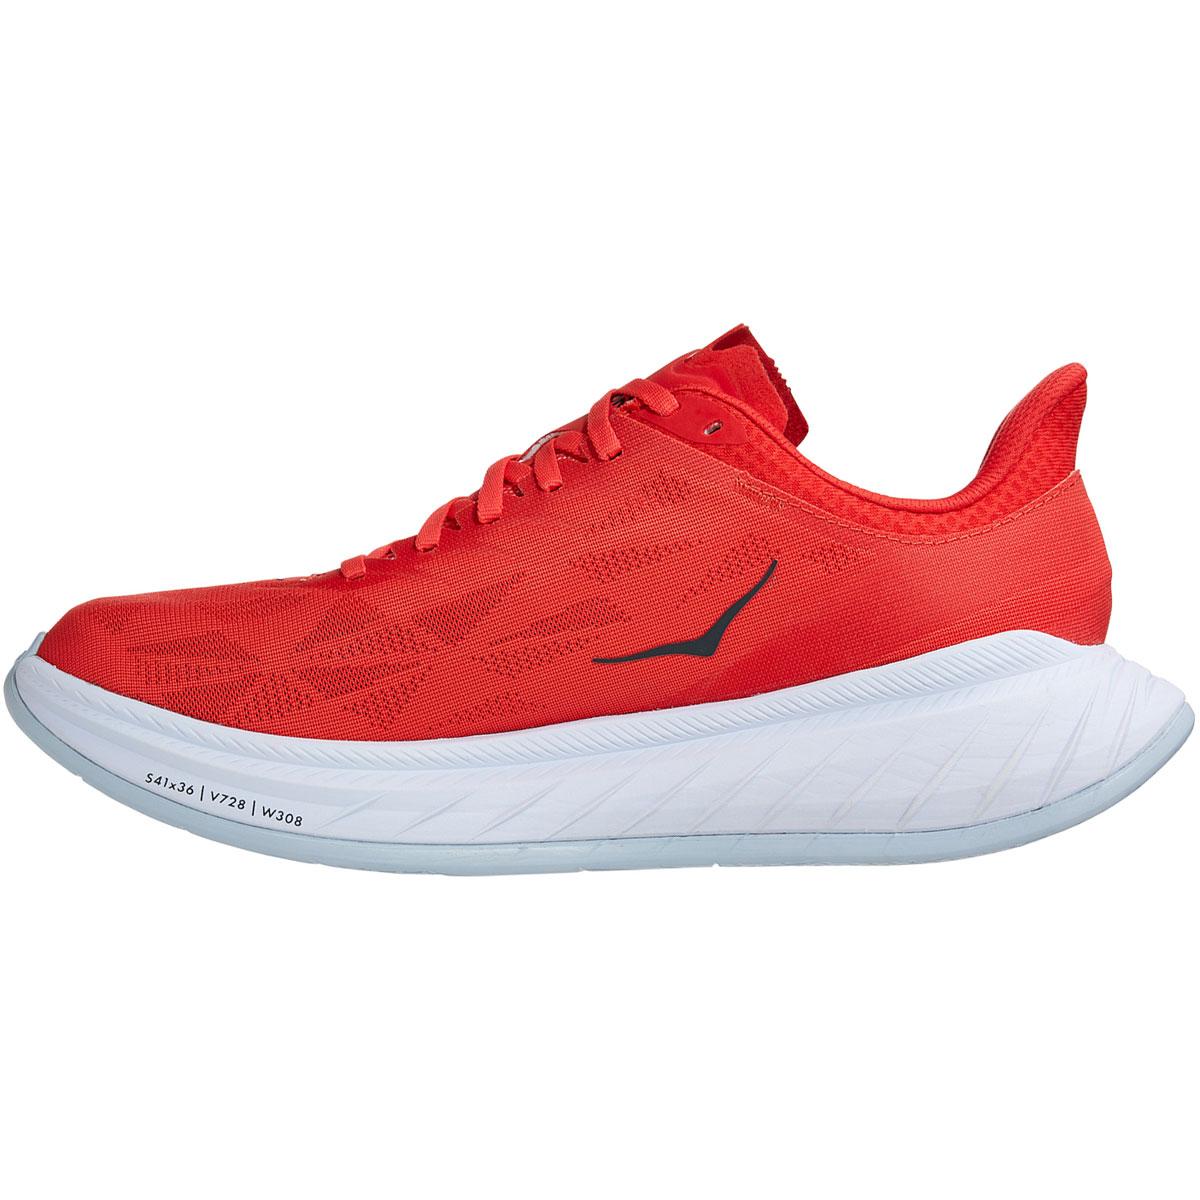 Men's Hoka One One Carbon X 2 Running Shoe - Color: Fiesta/White - Size: 9 - Width: Regular, Fiesta/White, large, image 2